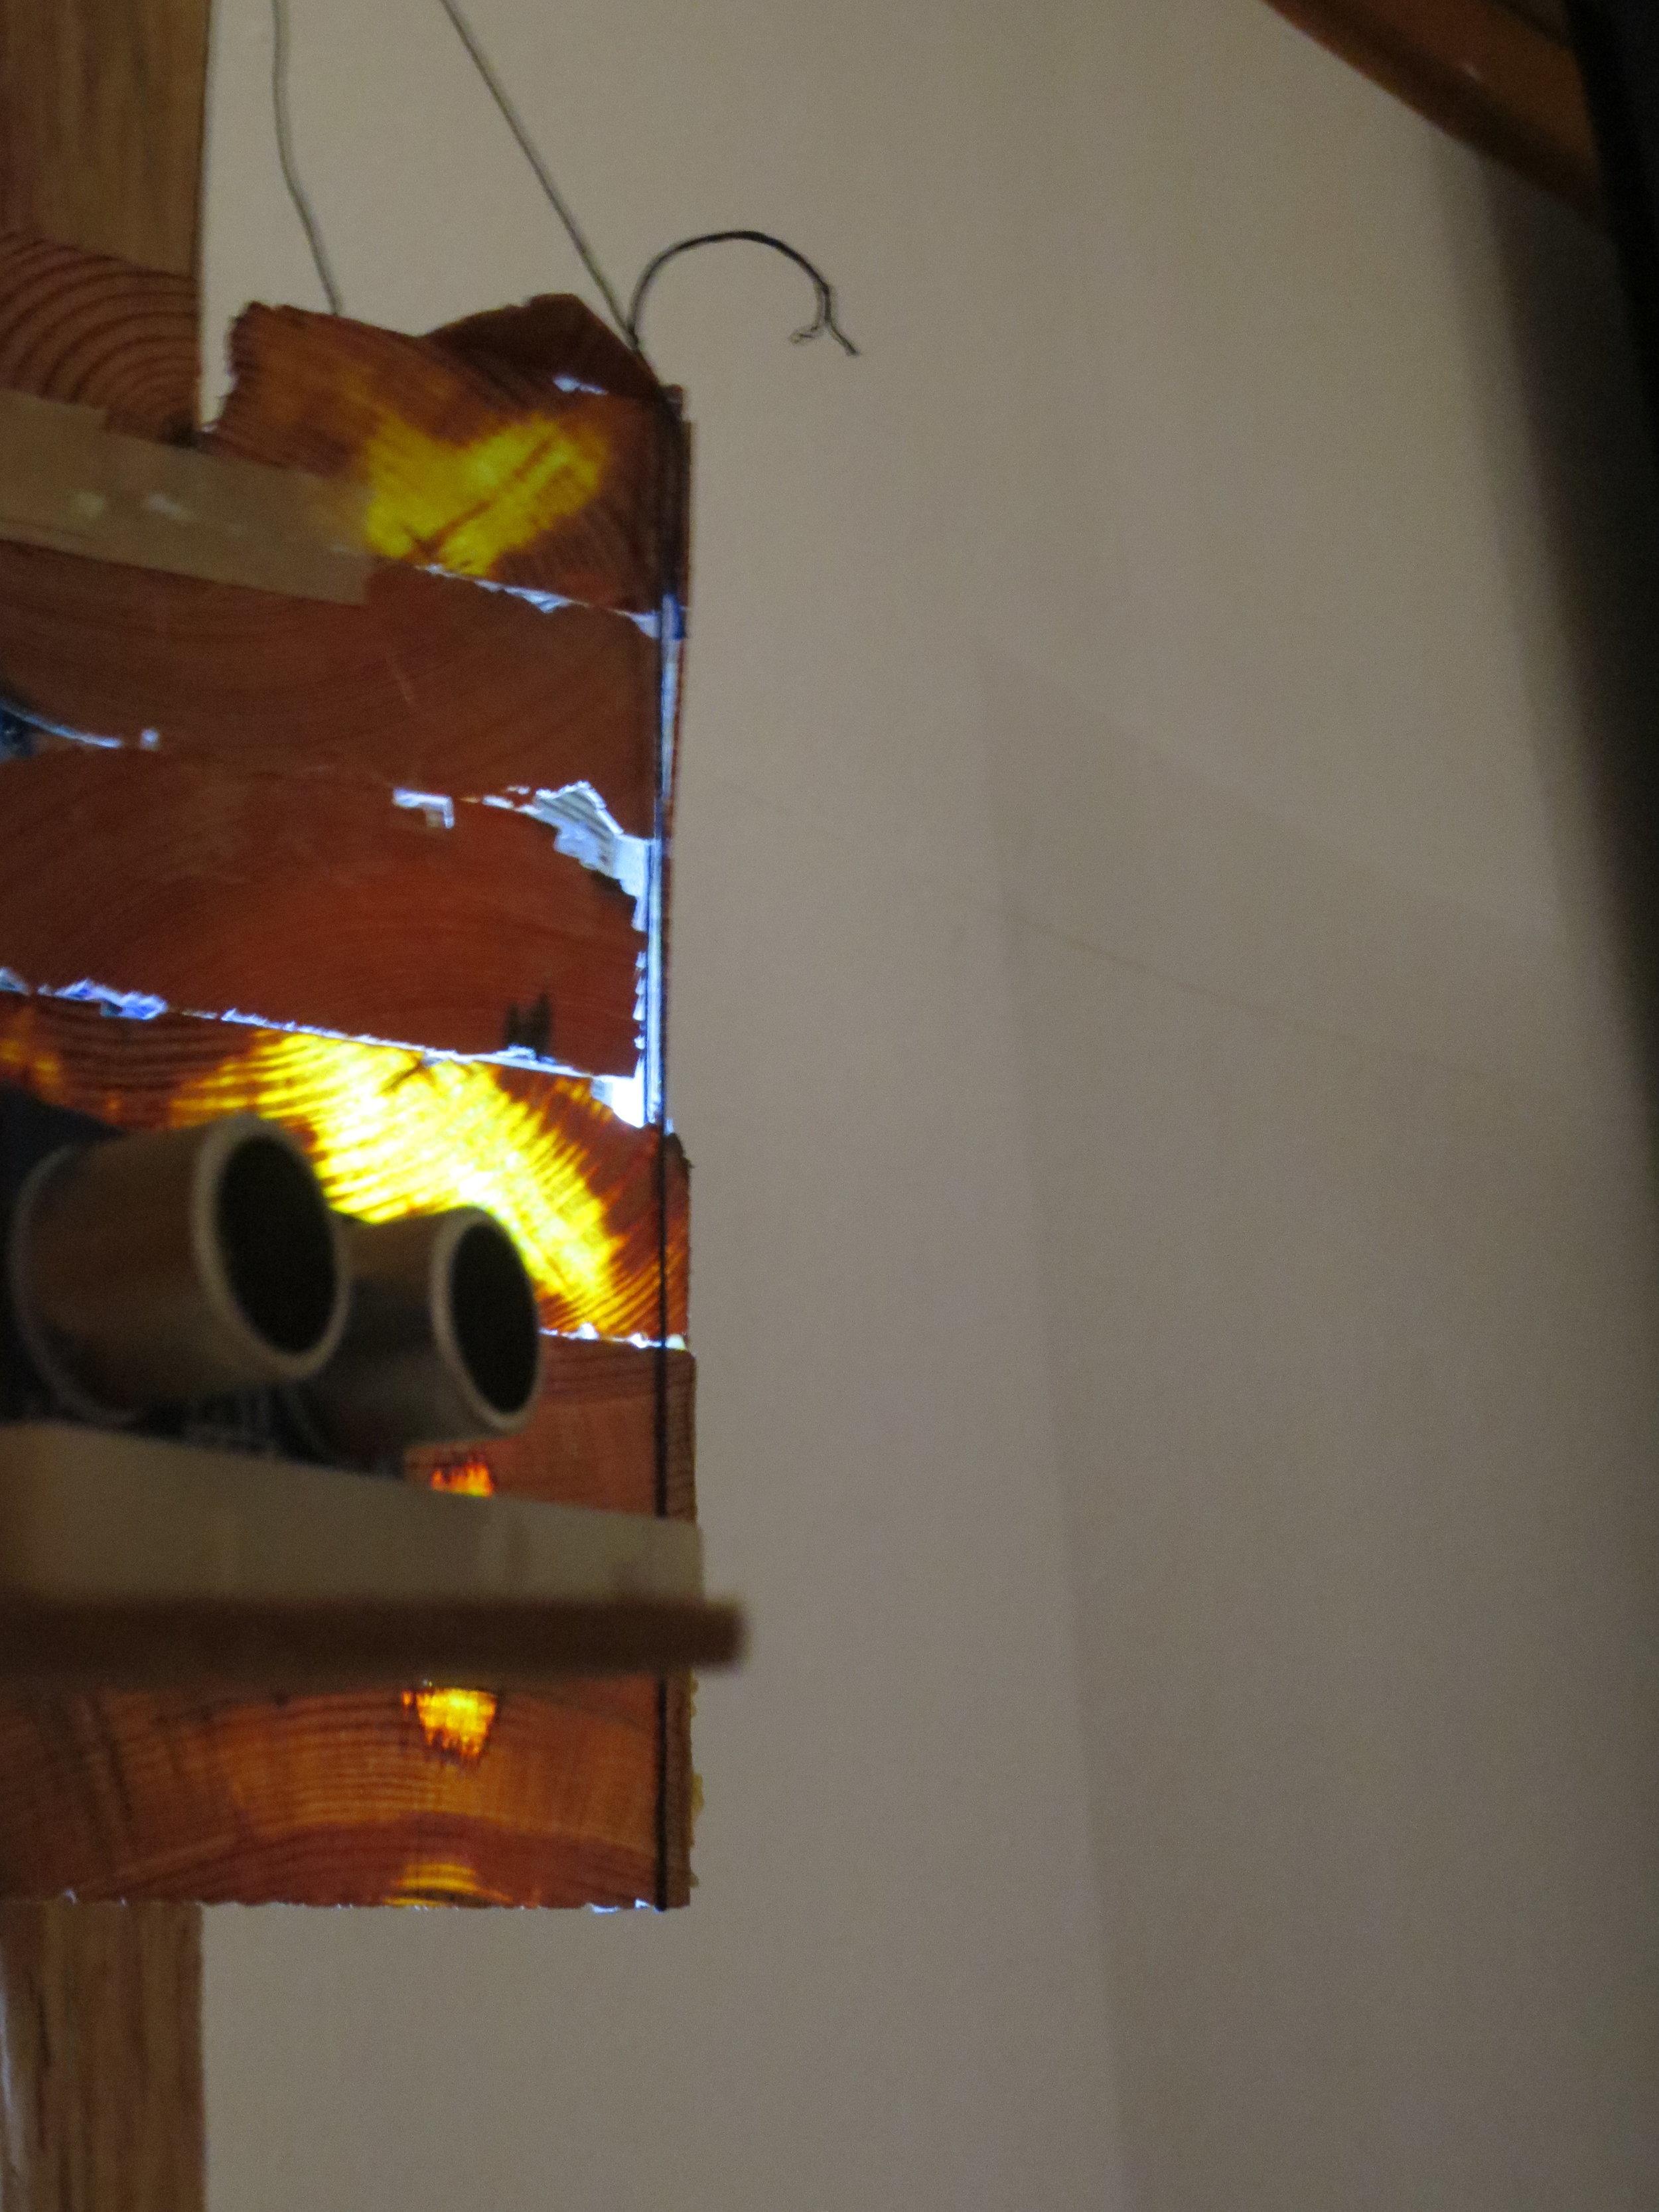 Arduino-controlled sonic sensor that controls light behind wooden lantern.